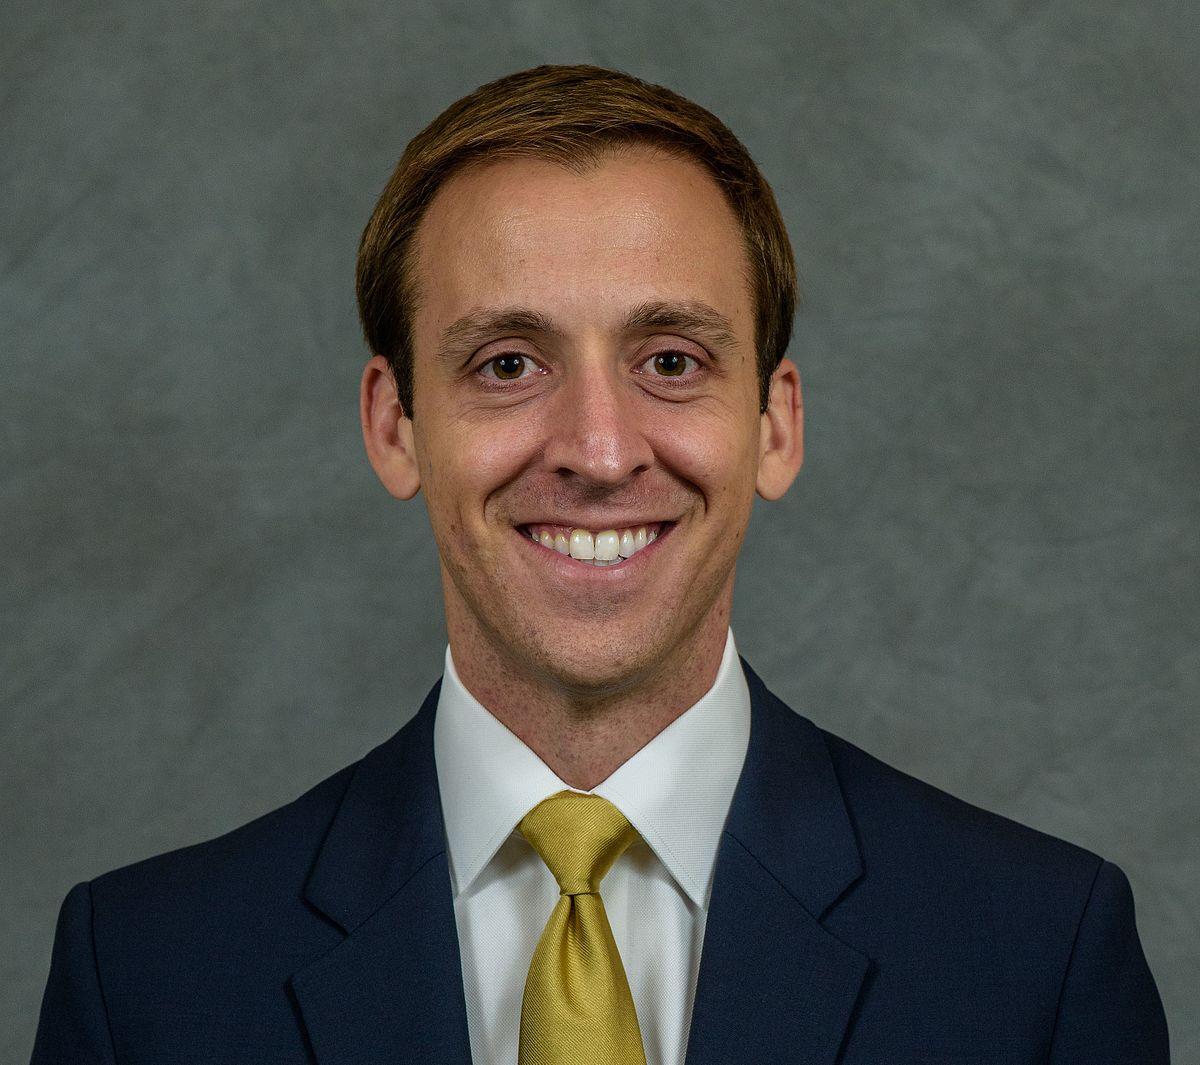 Brandon Gaudin - Wikipedia